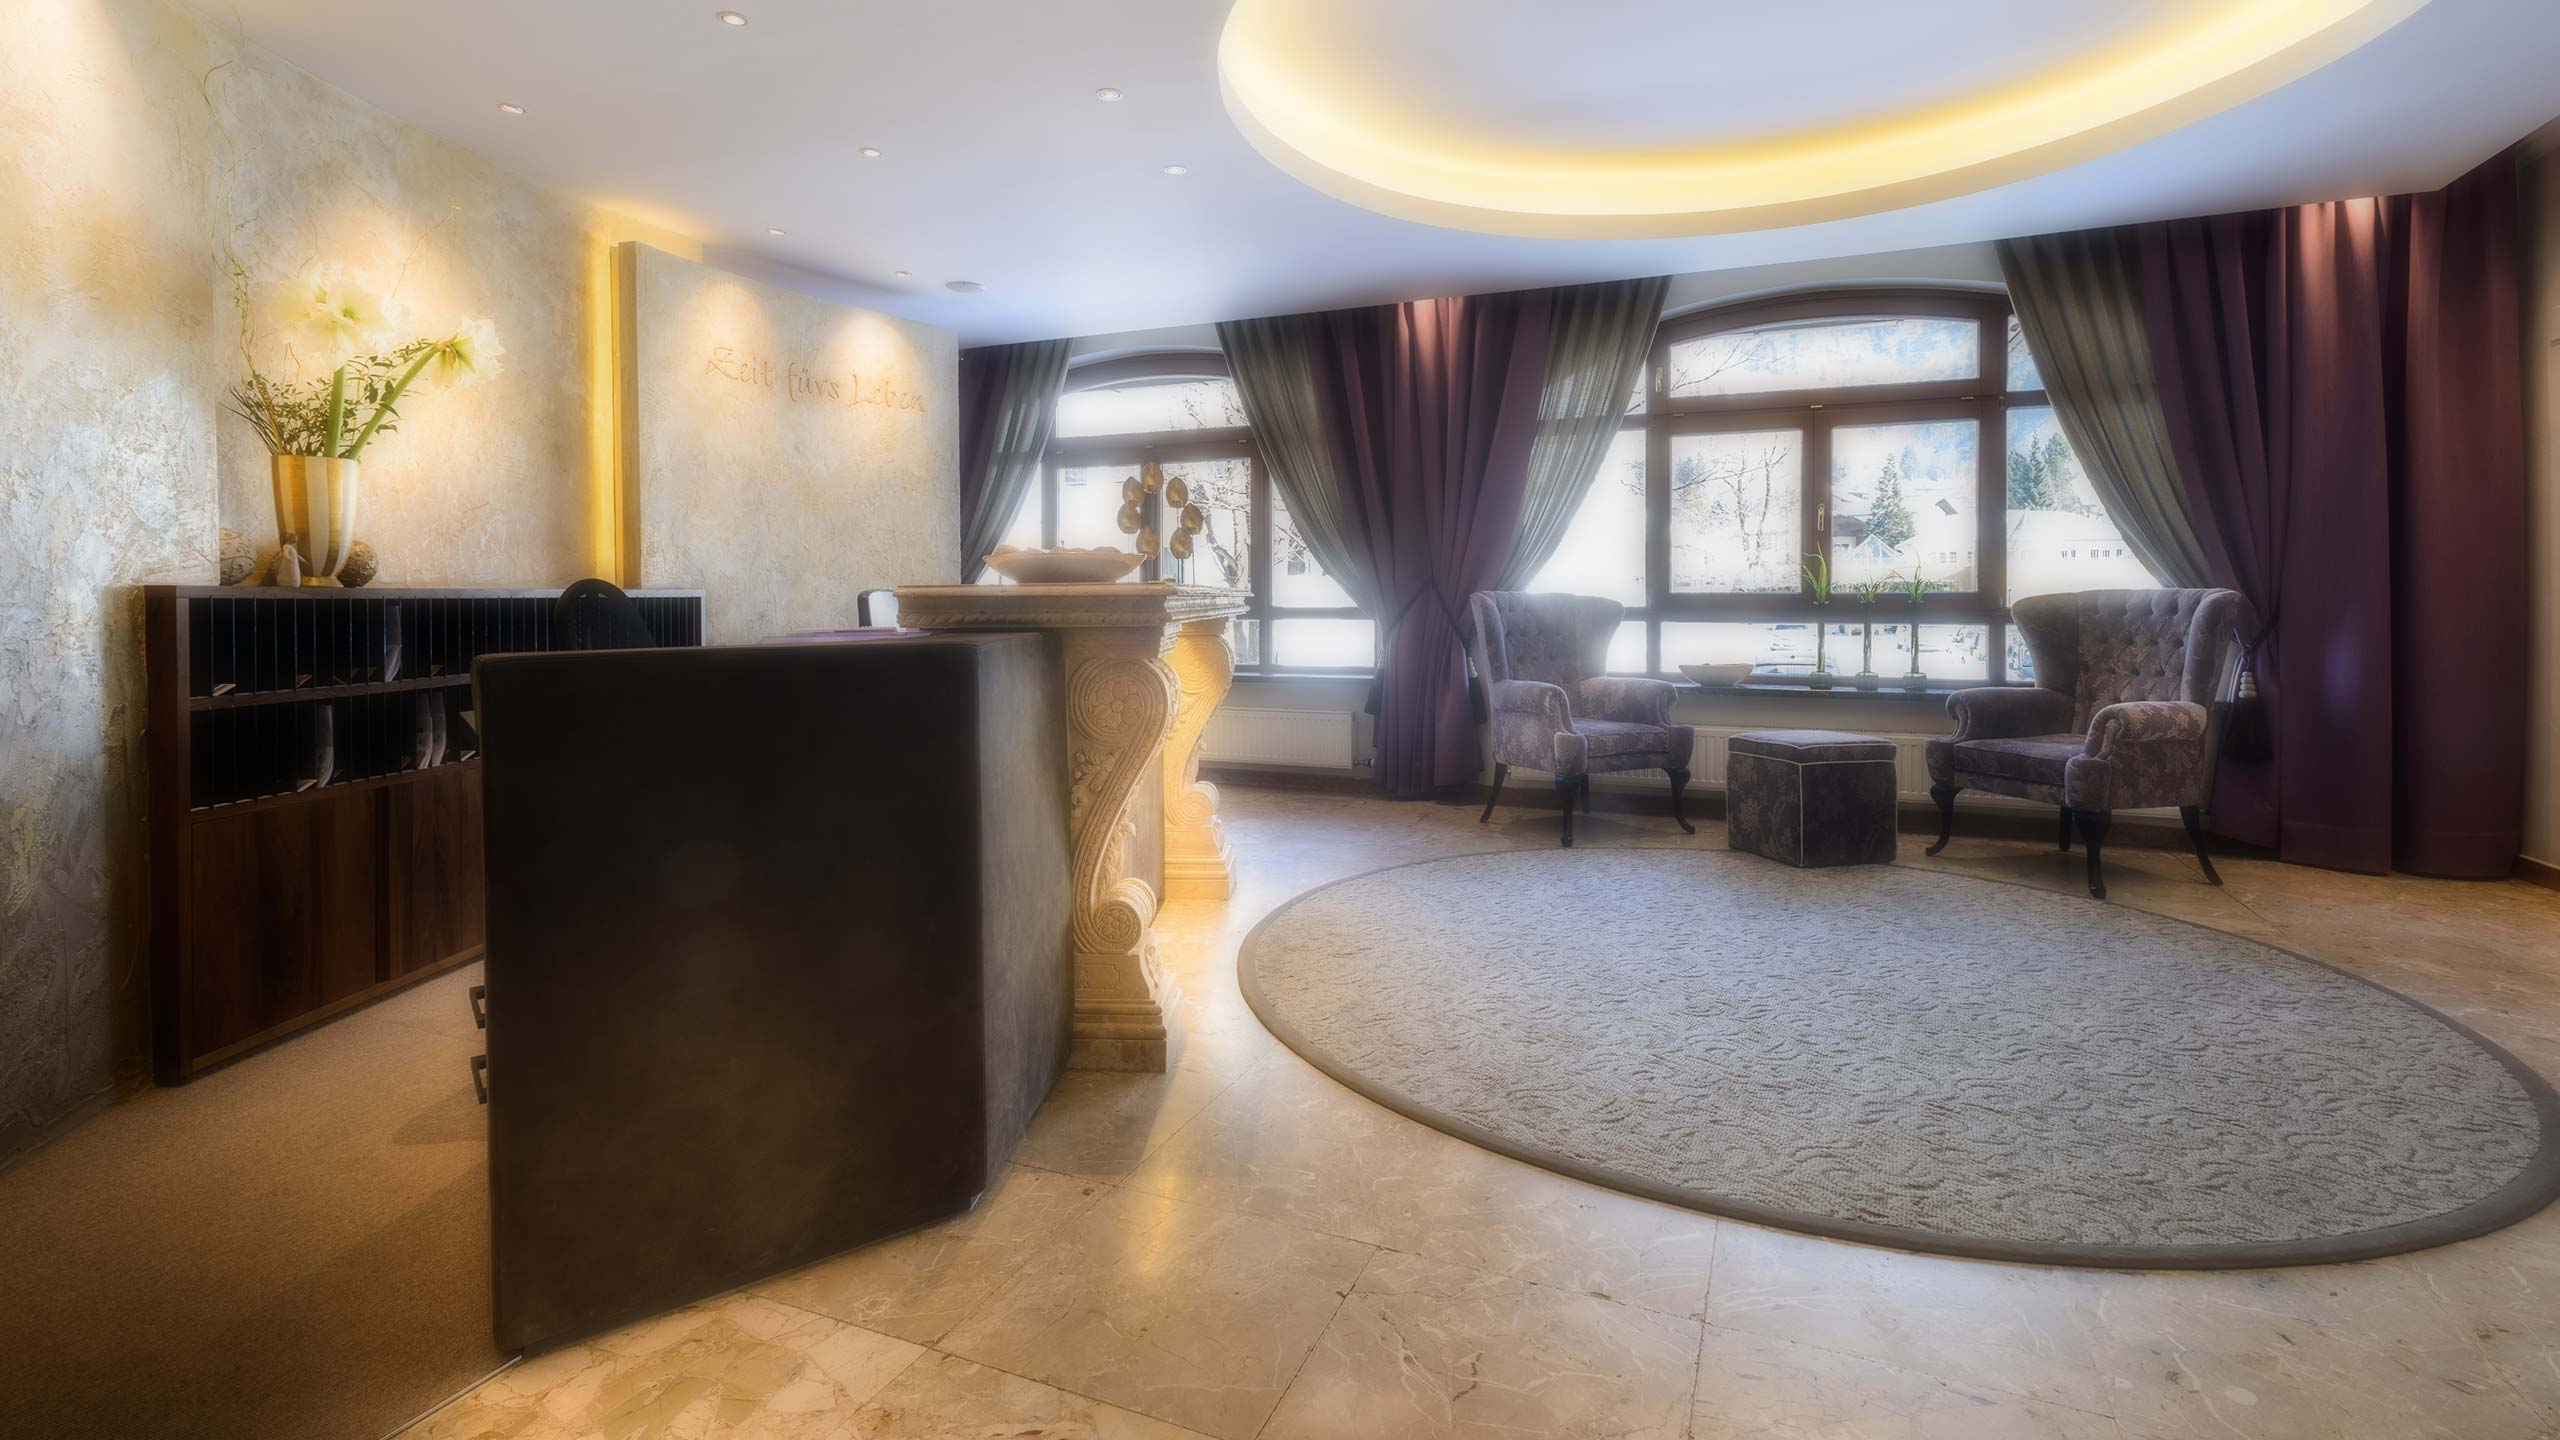 Wellneb Hotel In Karnten